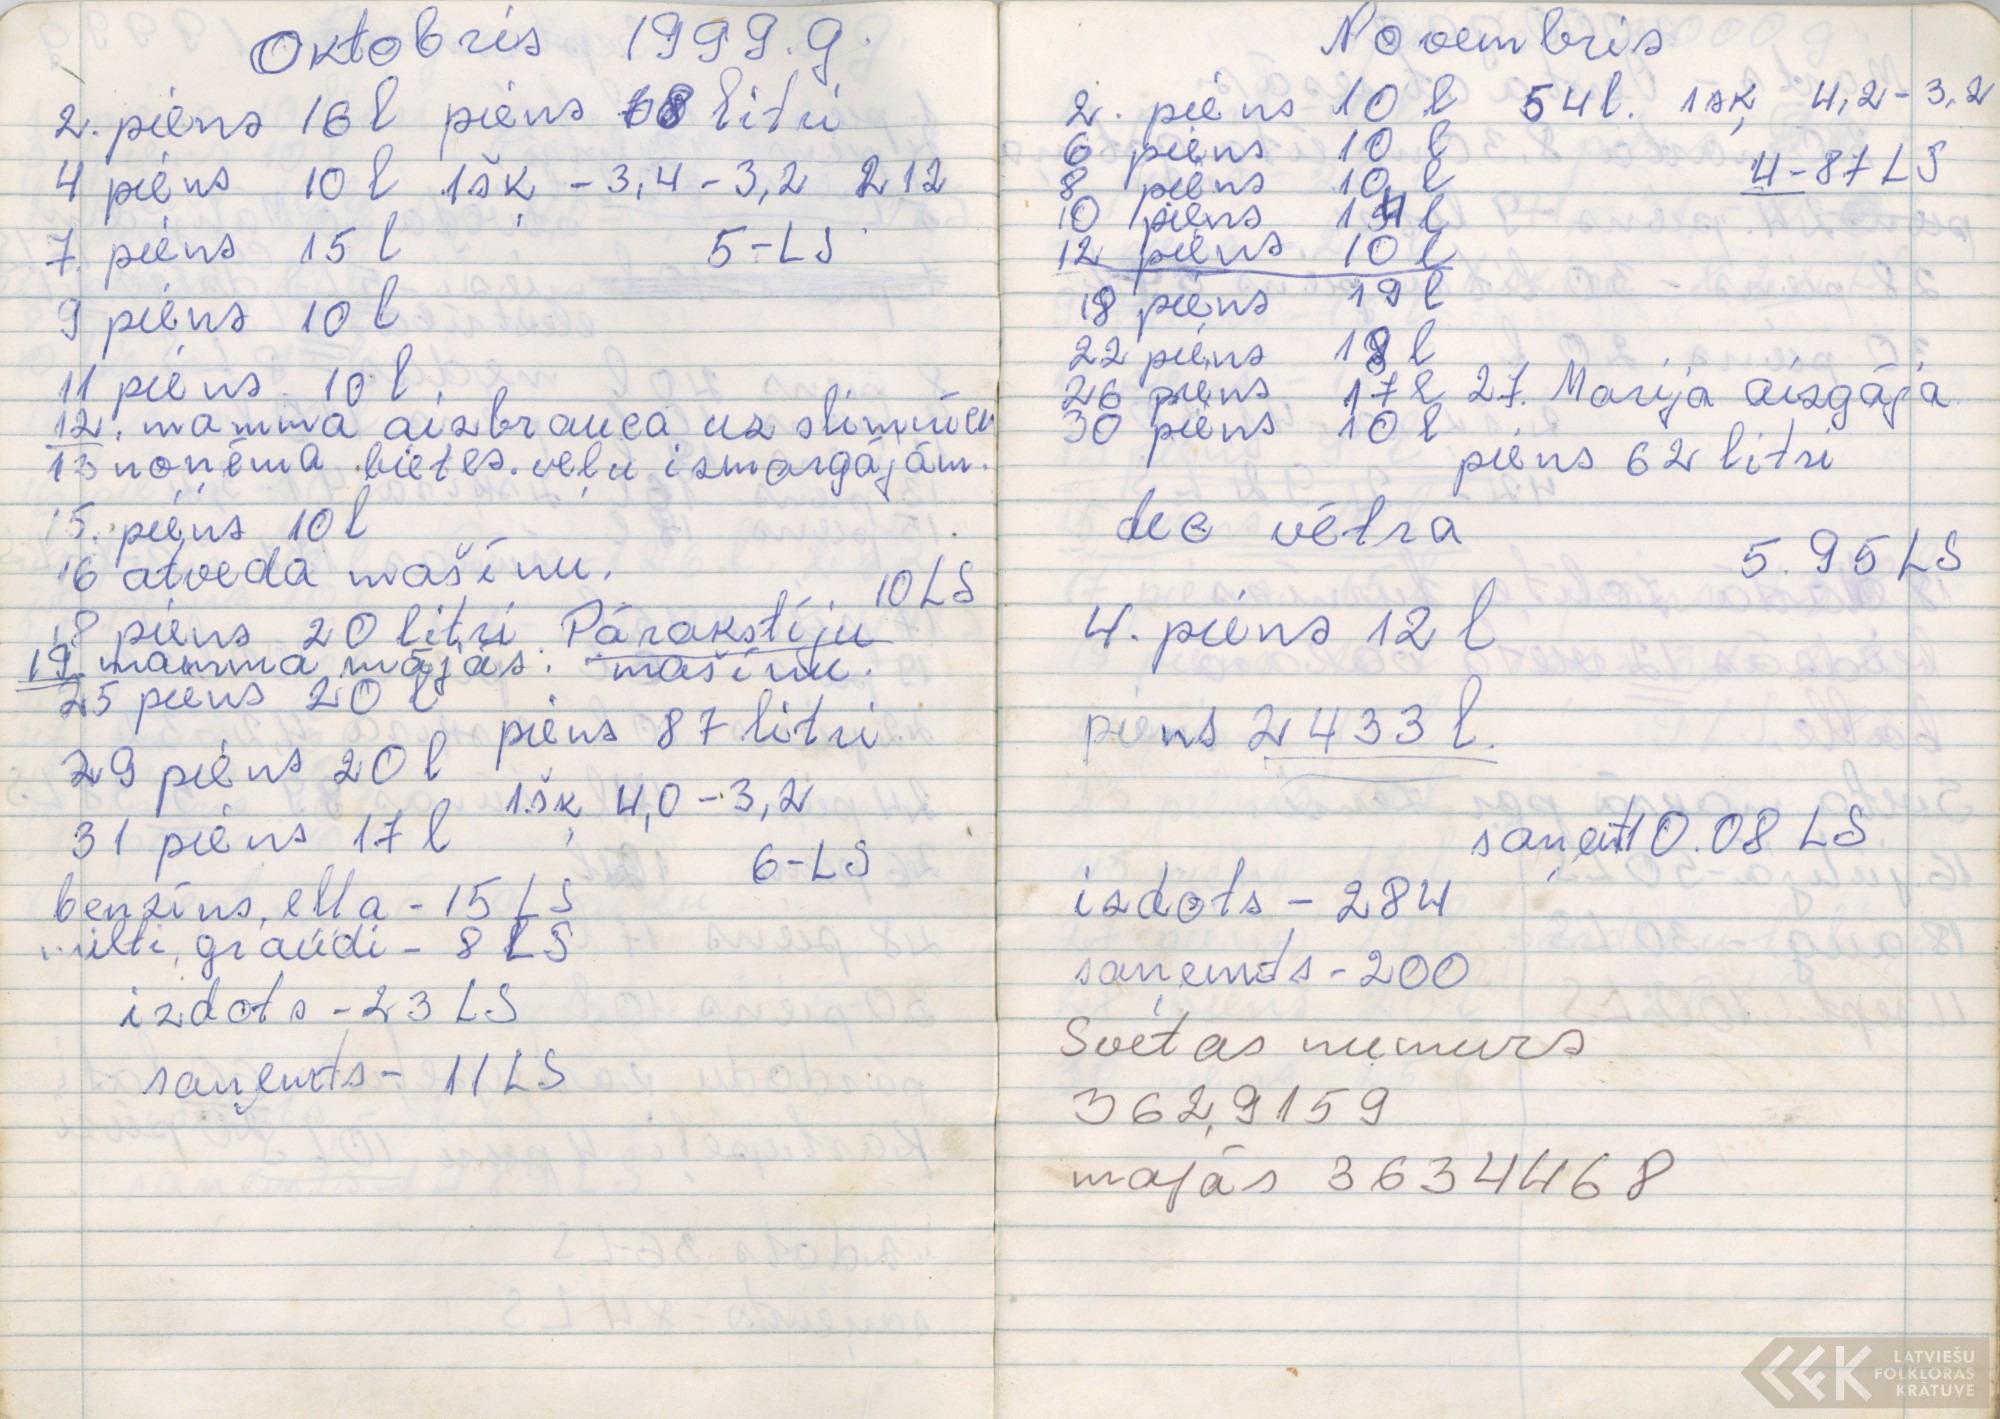 Ak139-Zigridas-Paegles-dienasgramatas-02-0005